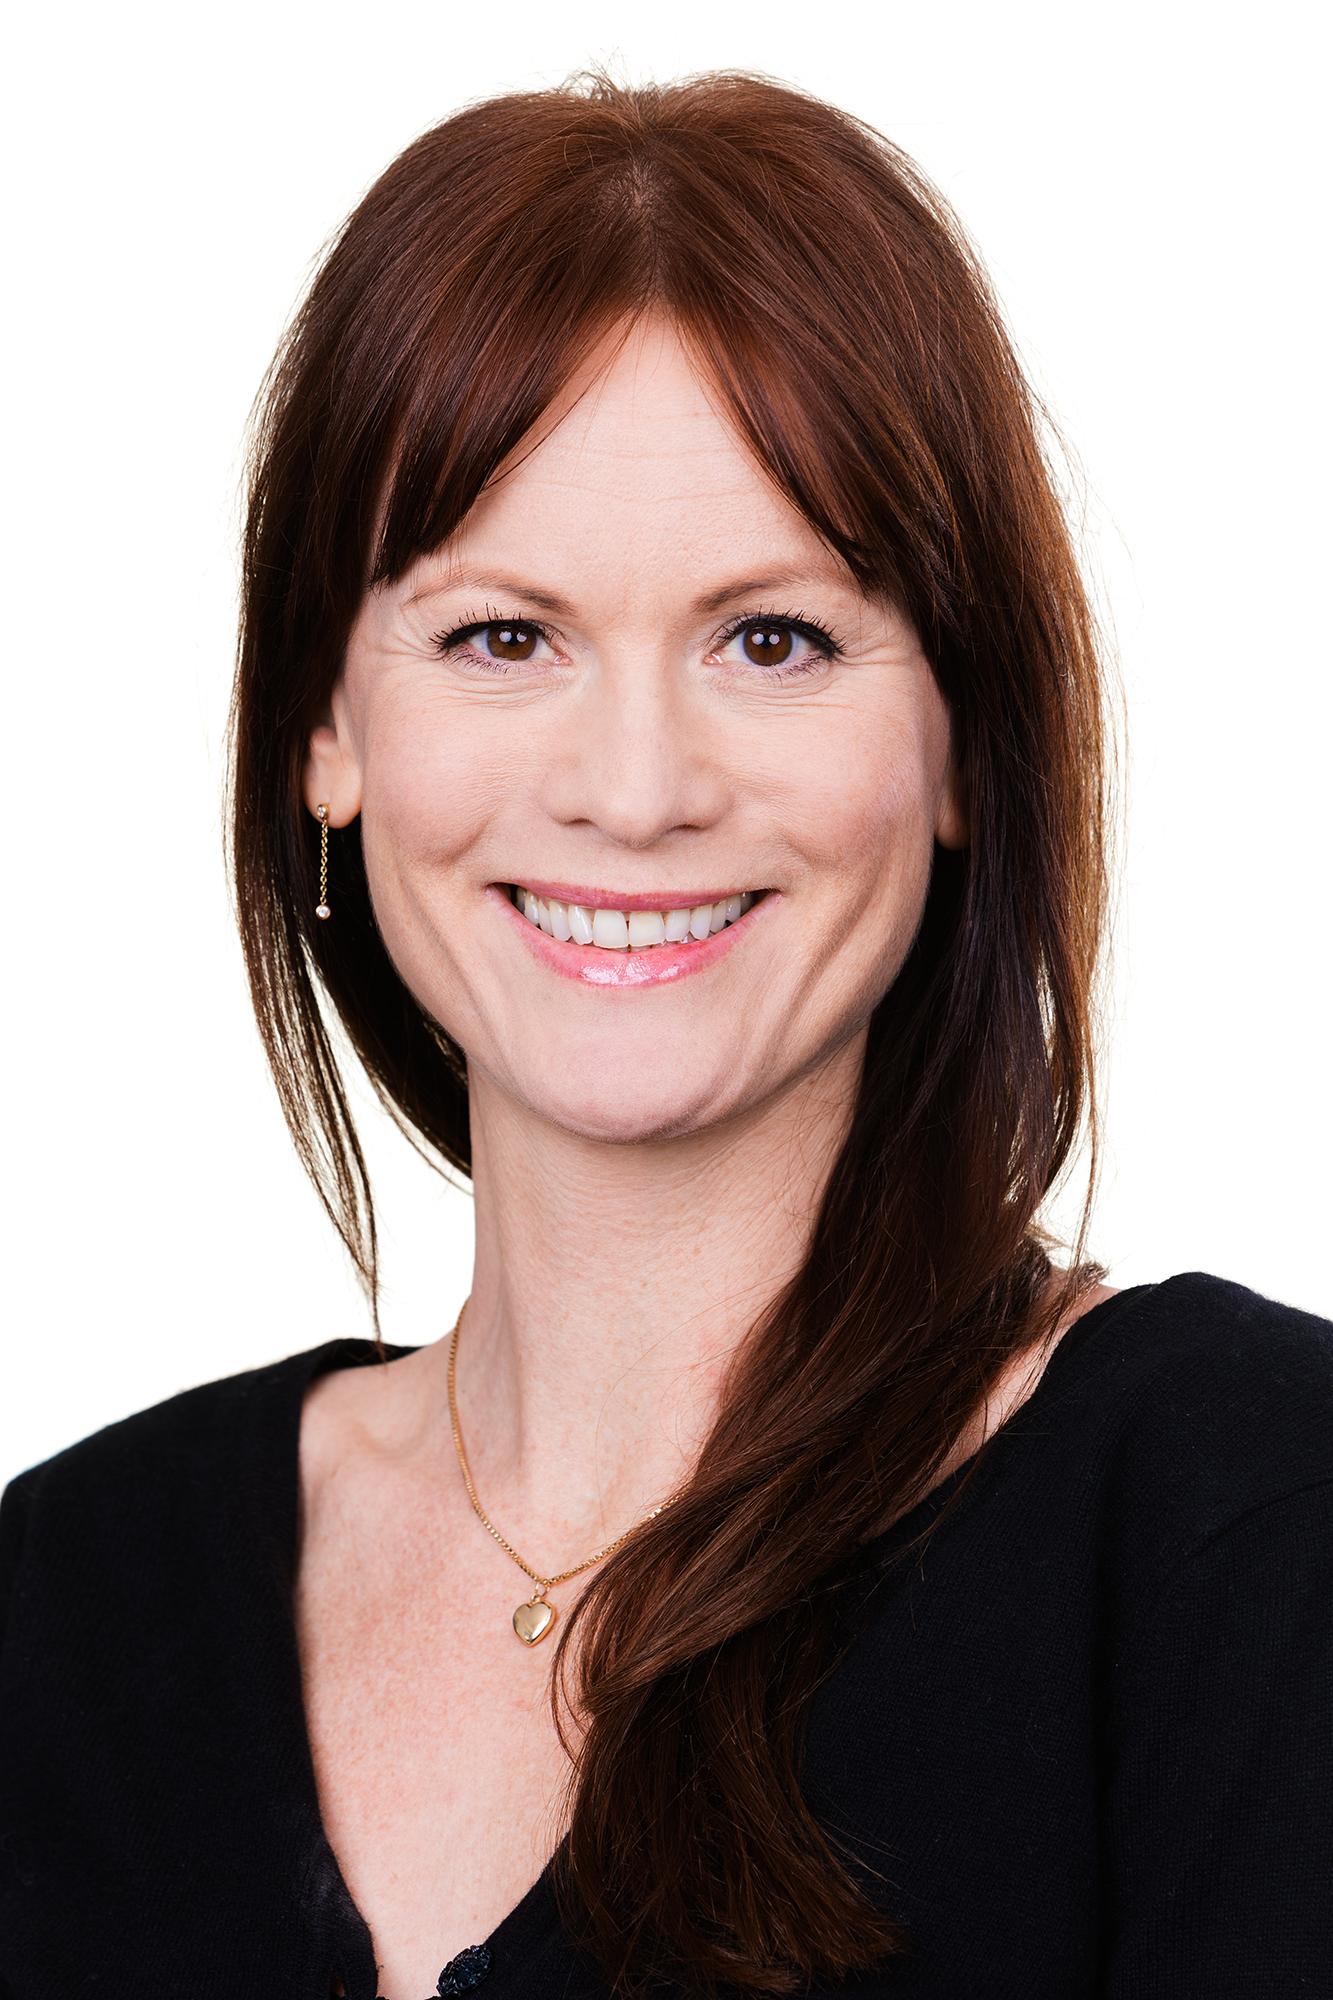 Lena Svenberg